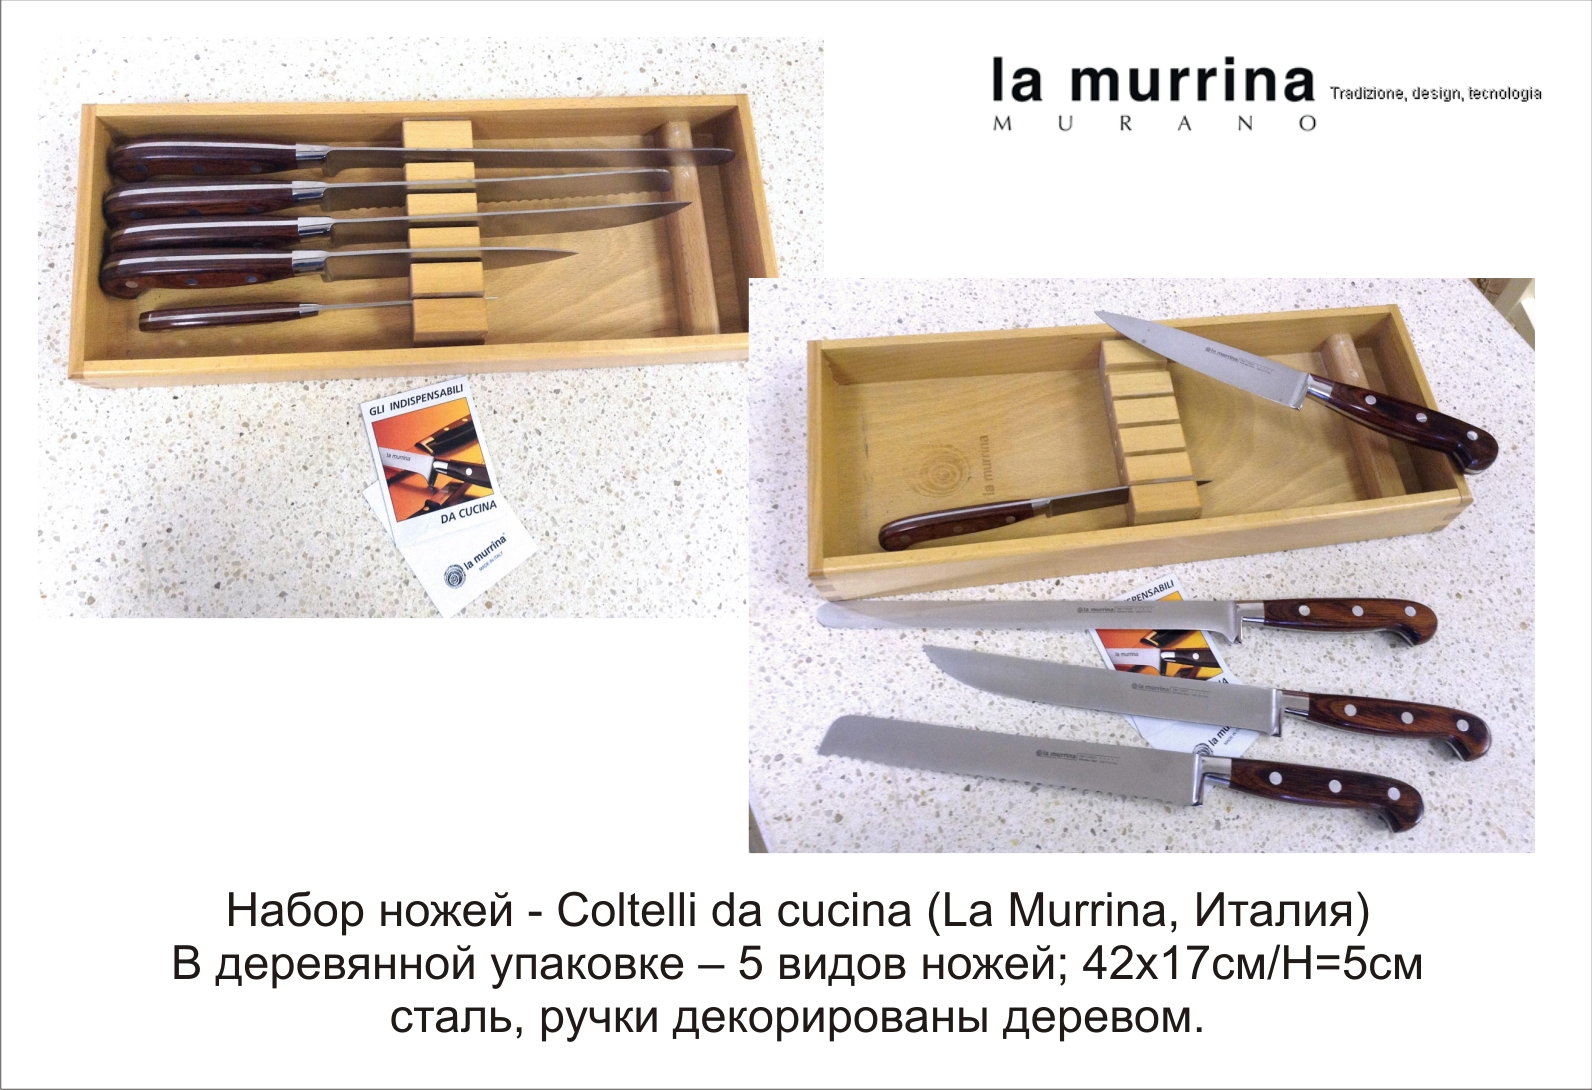 La Murrina - Coltelli da cucina